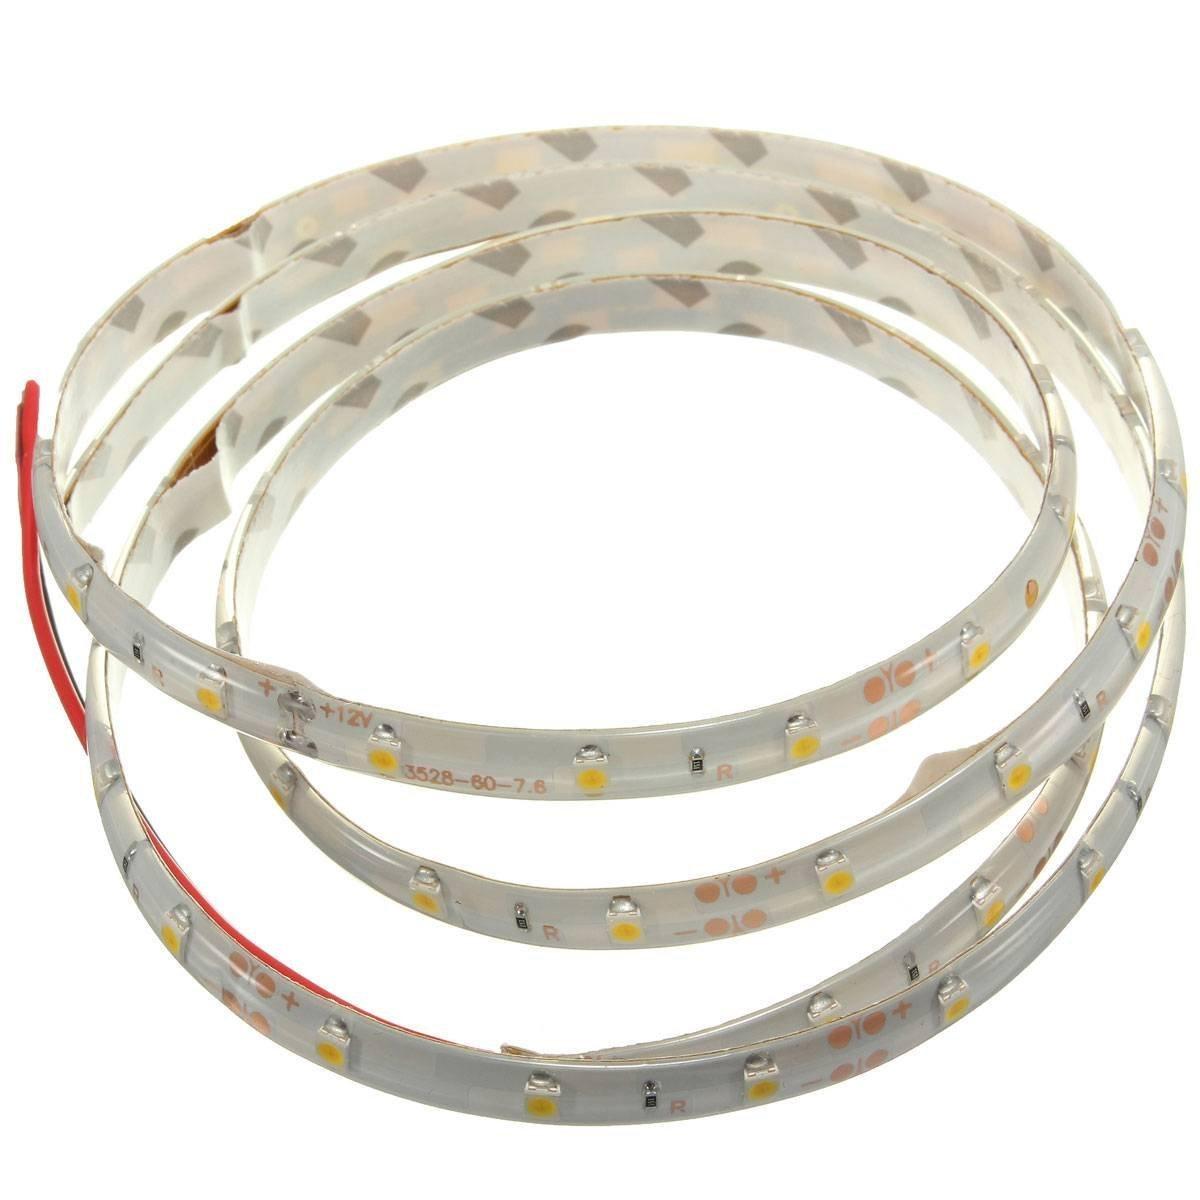 LED Strip Lumineuse - TOOGOO(R)1M 60-3528 SMD etanche LED Strip Lumineuse DC12V(Blanc Chaud) GOMASINSUD74915